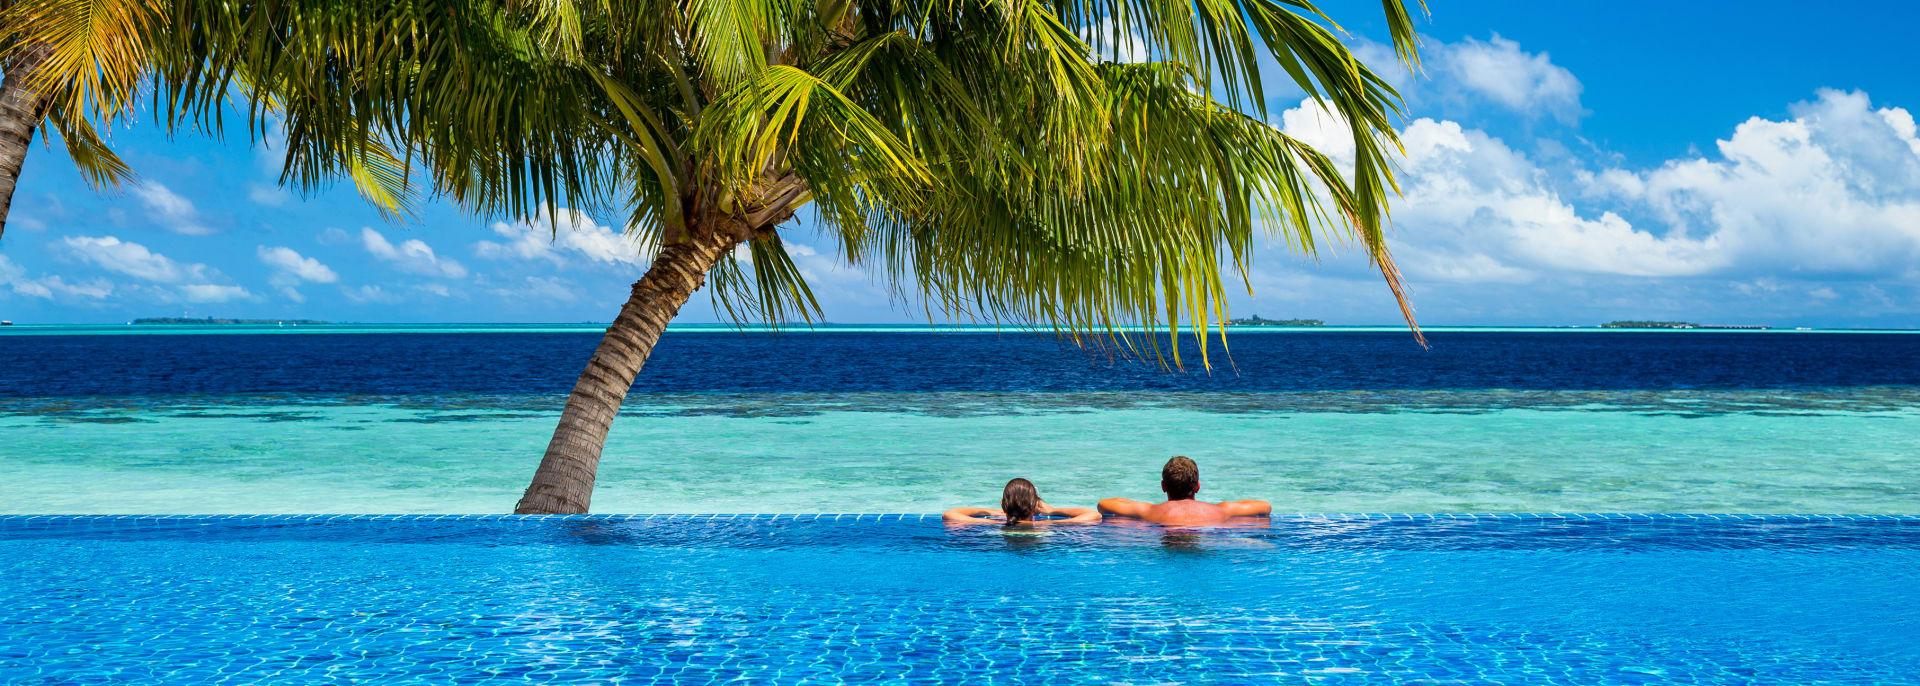 Paar im Pool, Costa Rica